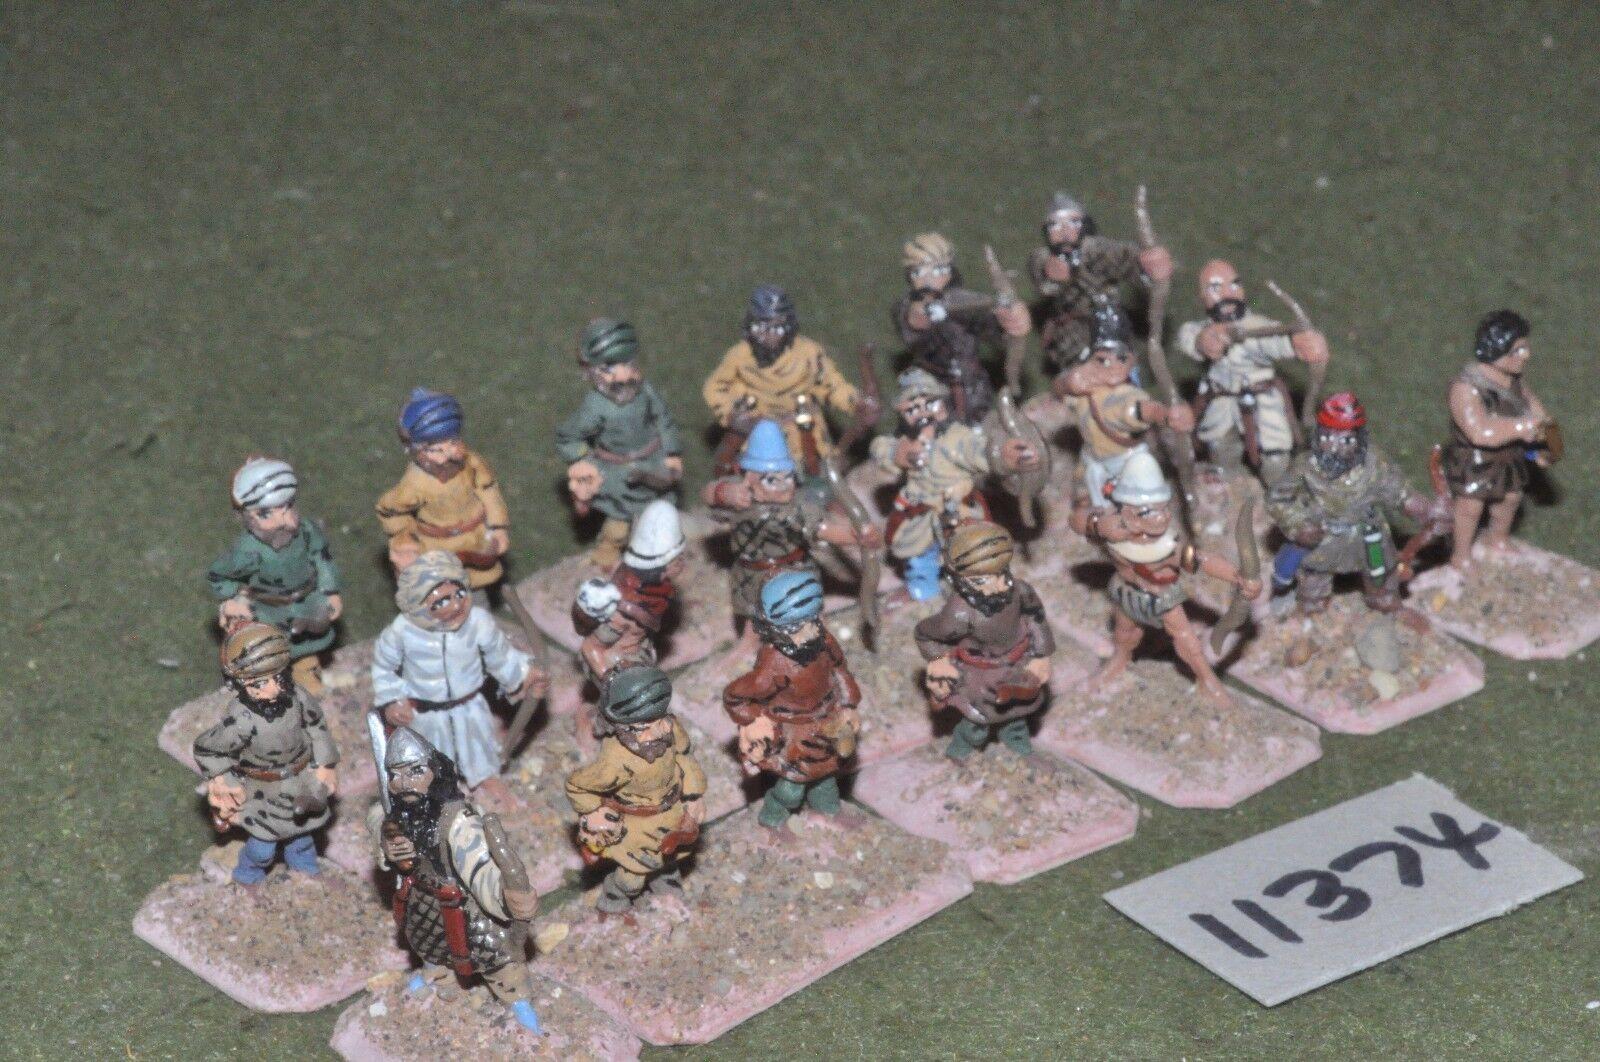 25mm medieval   gasgan - archers 20 figs - inf (11374)